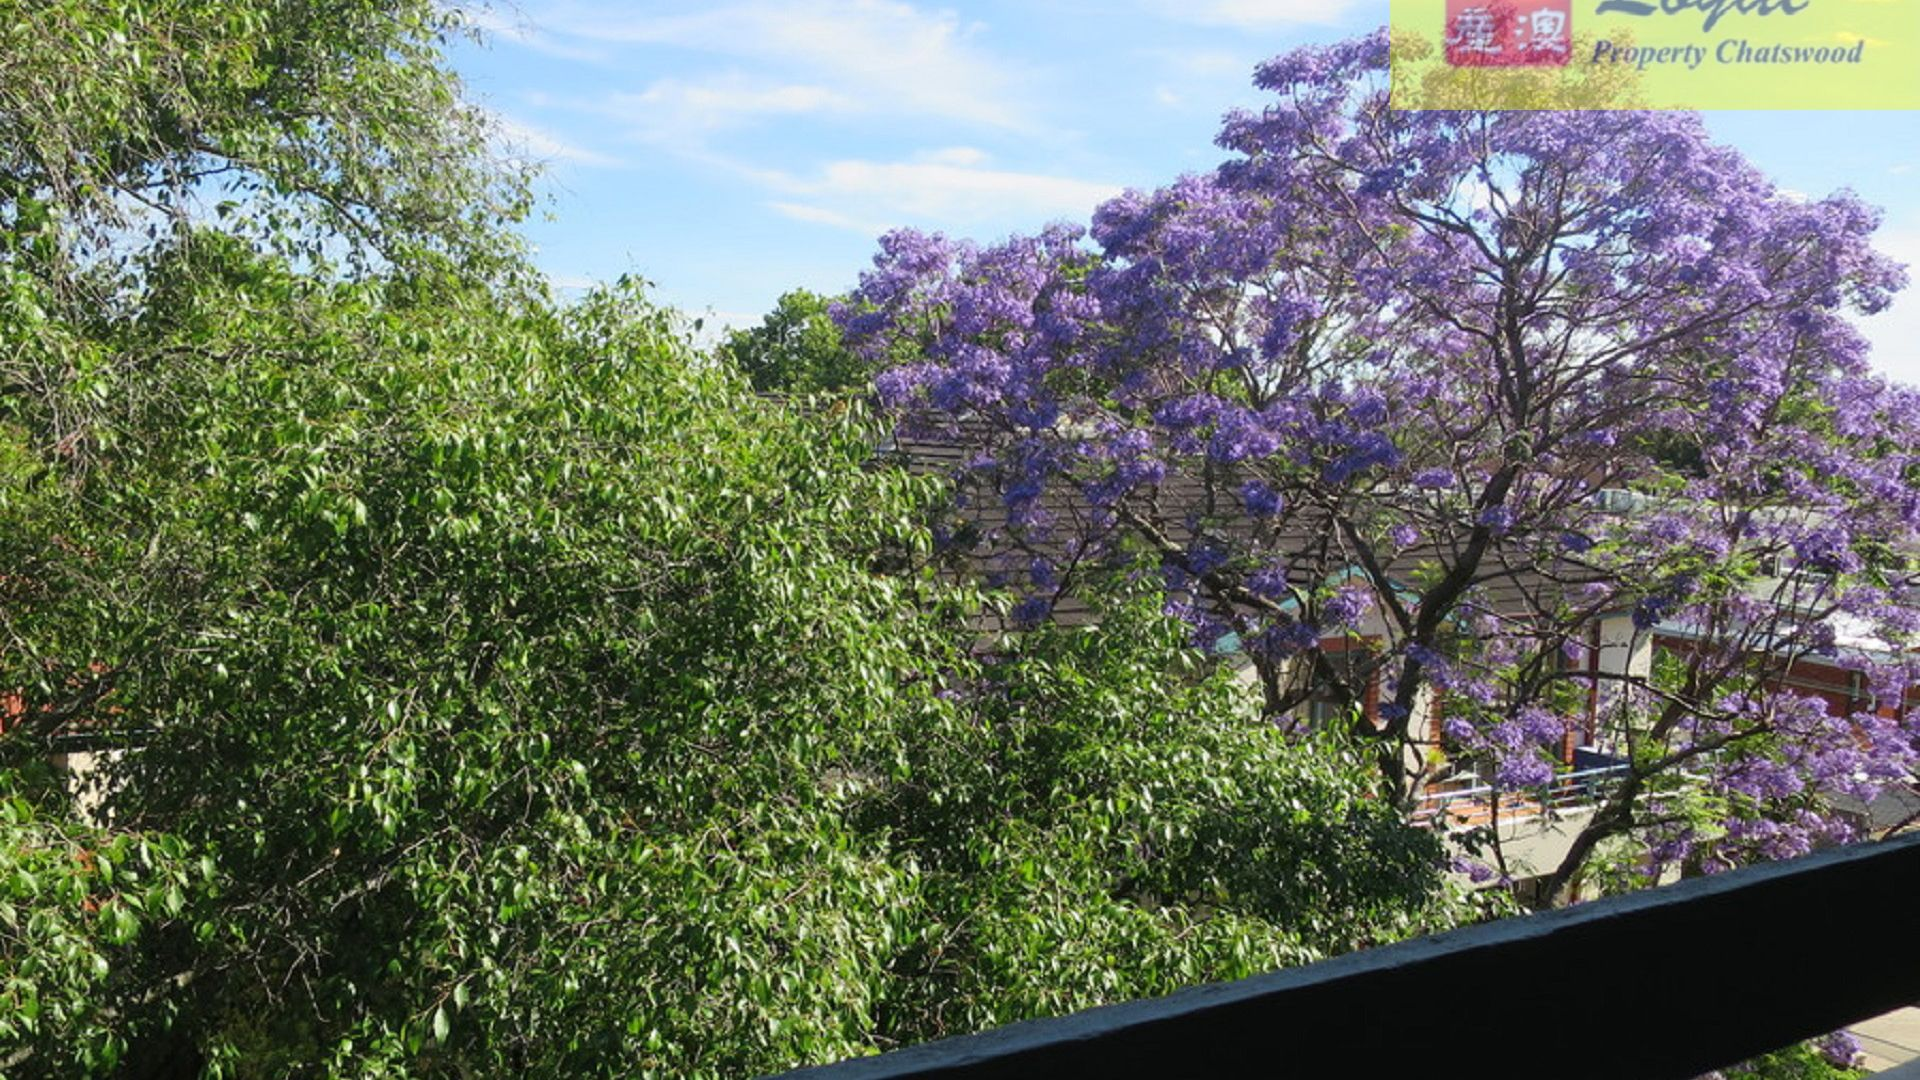 17/61-63 Hercules Street, Chatswood NSW 2067, Image 2